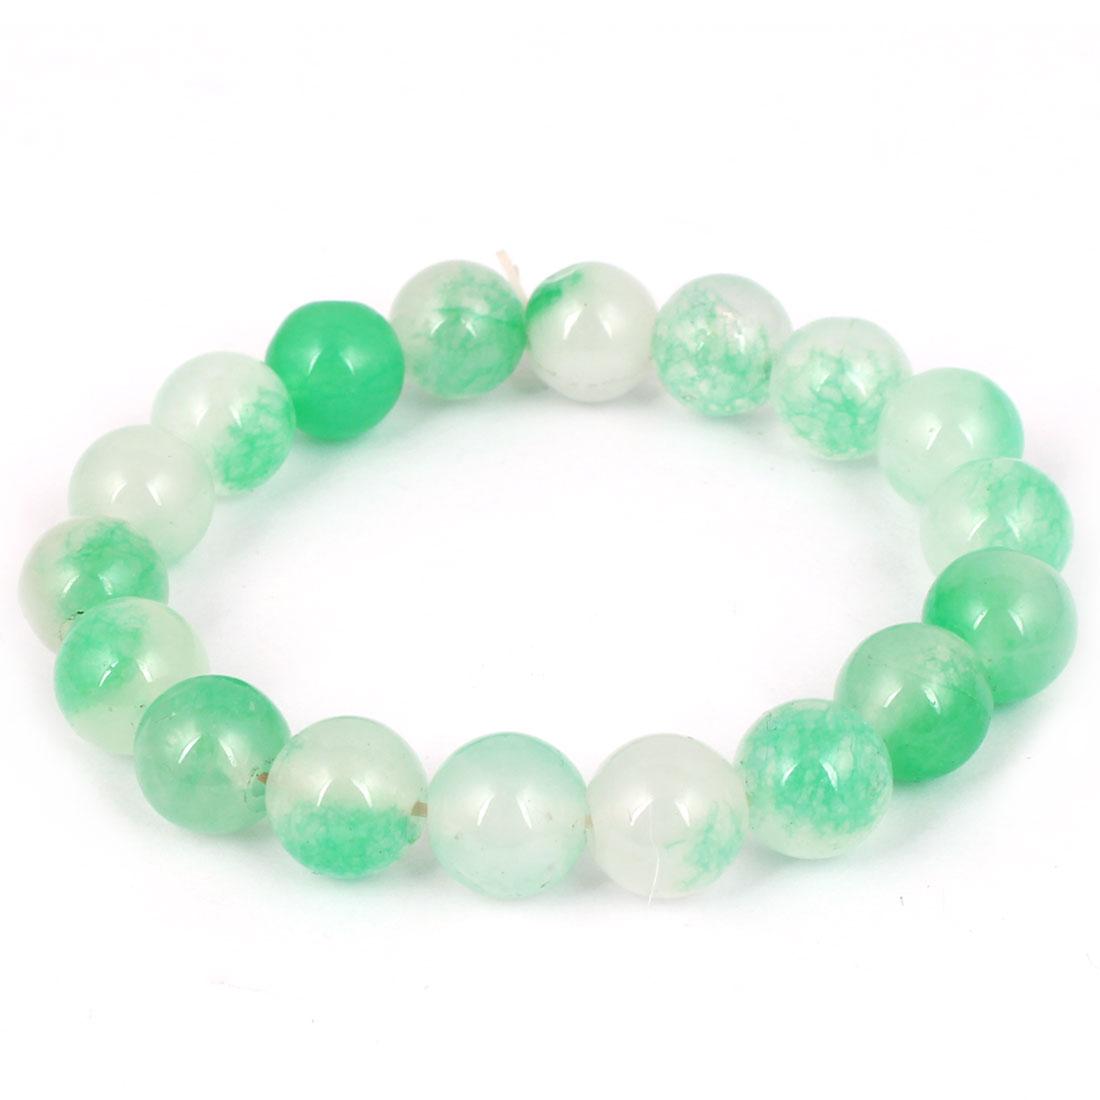 Girl Lady Party Charm Fashion Jewelry Elastic Stone Beads Bracelet Green White